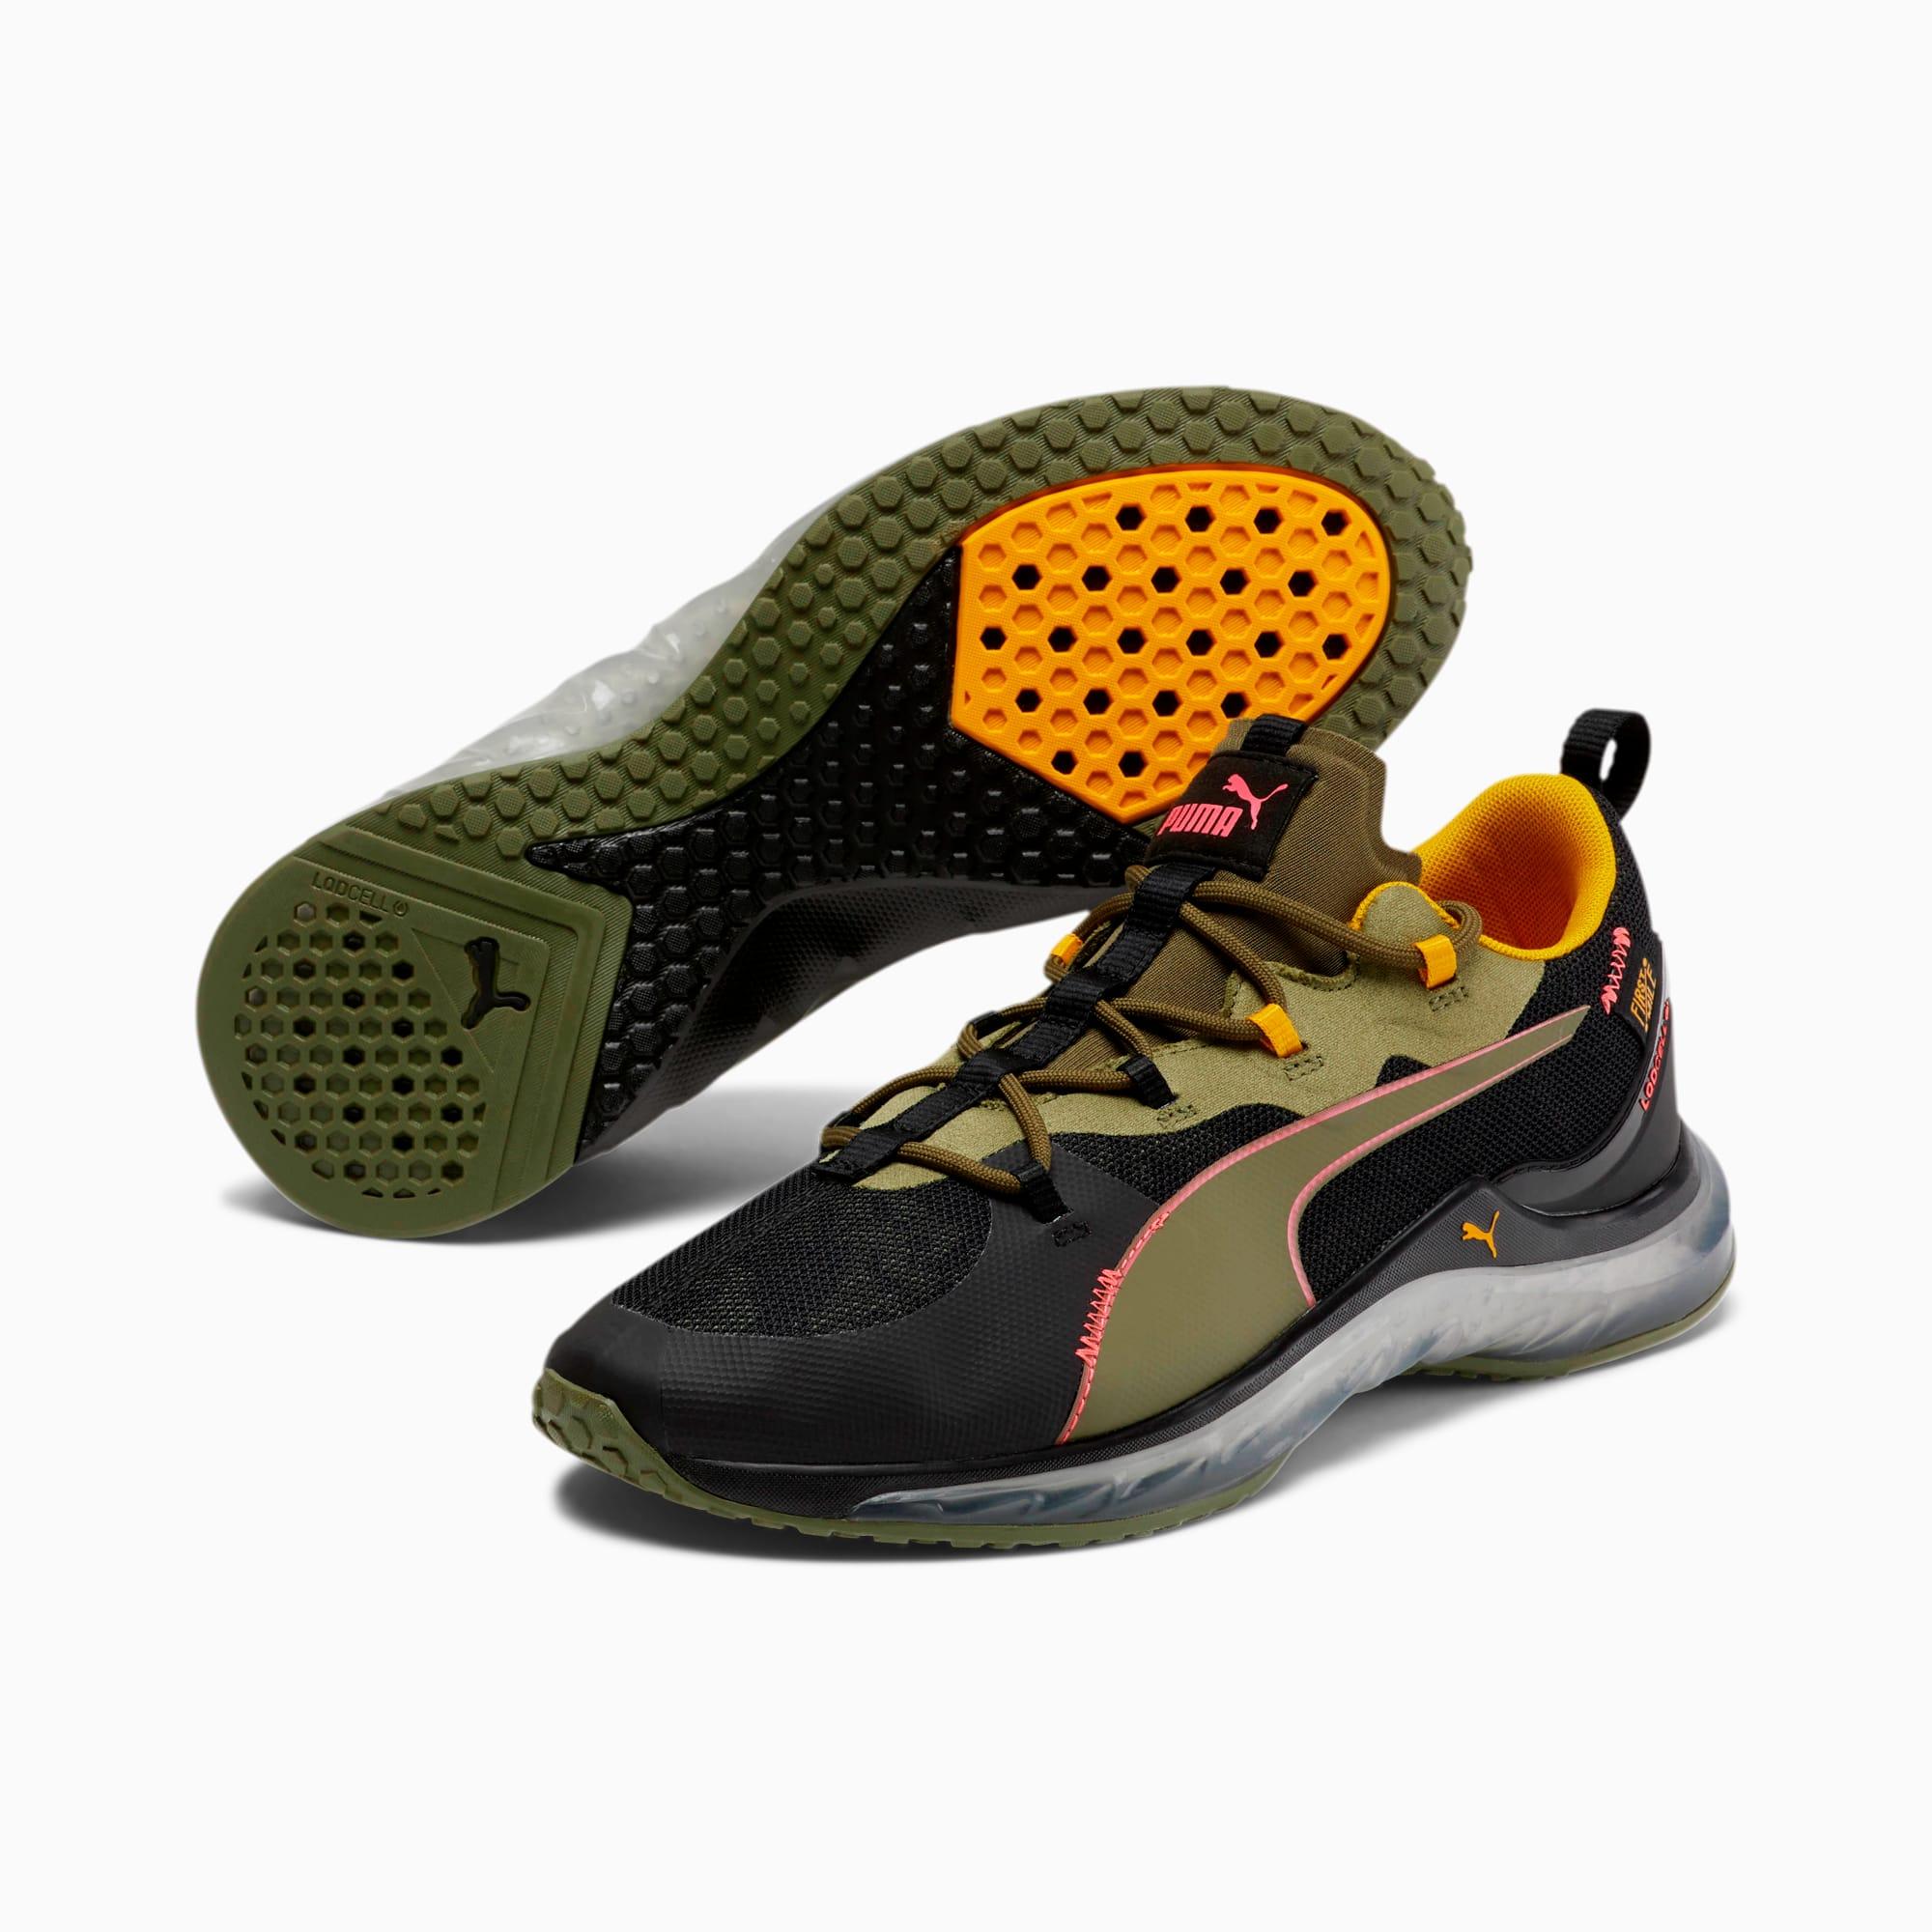 Zapatos de entrenamiento PUMA x FIRST MILE LQDCELL Hydra Camo para hombre